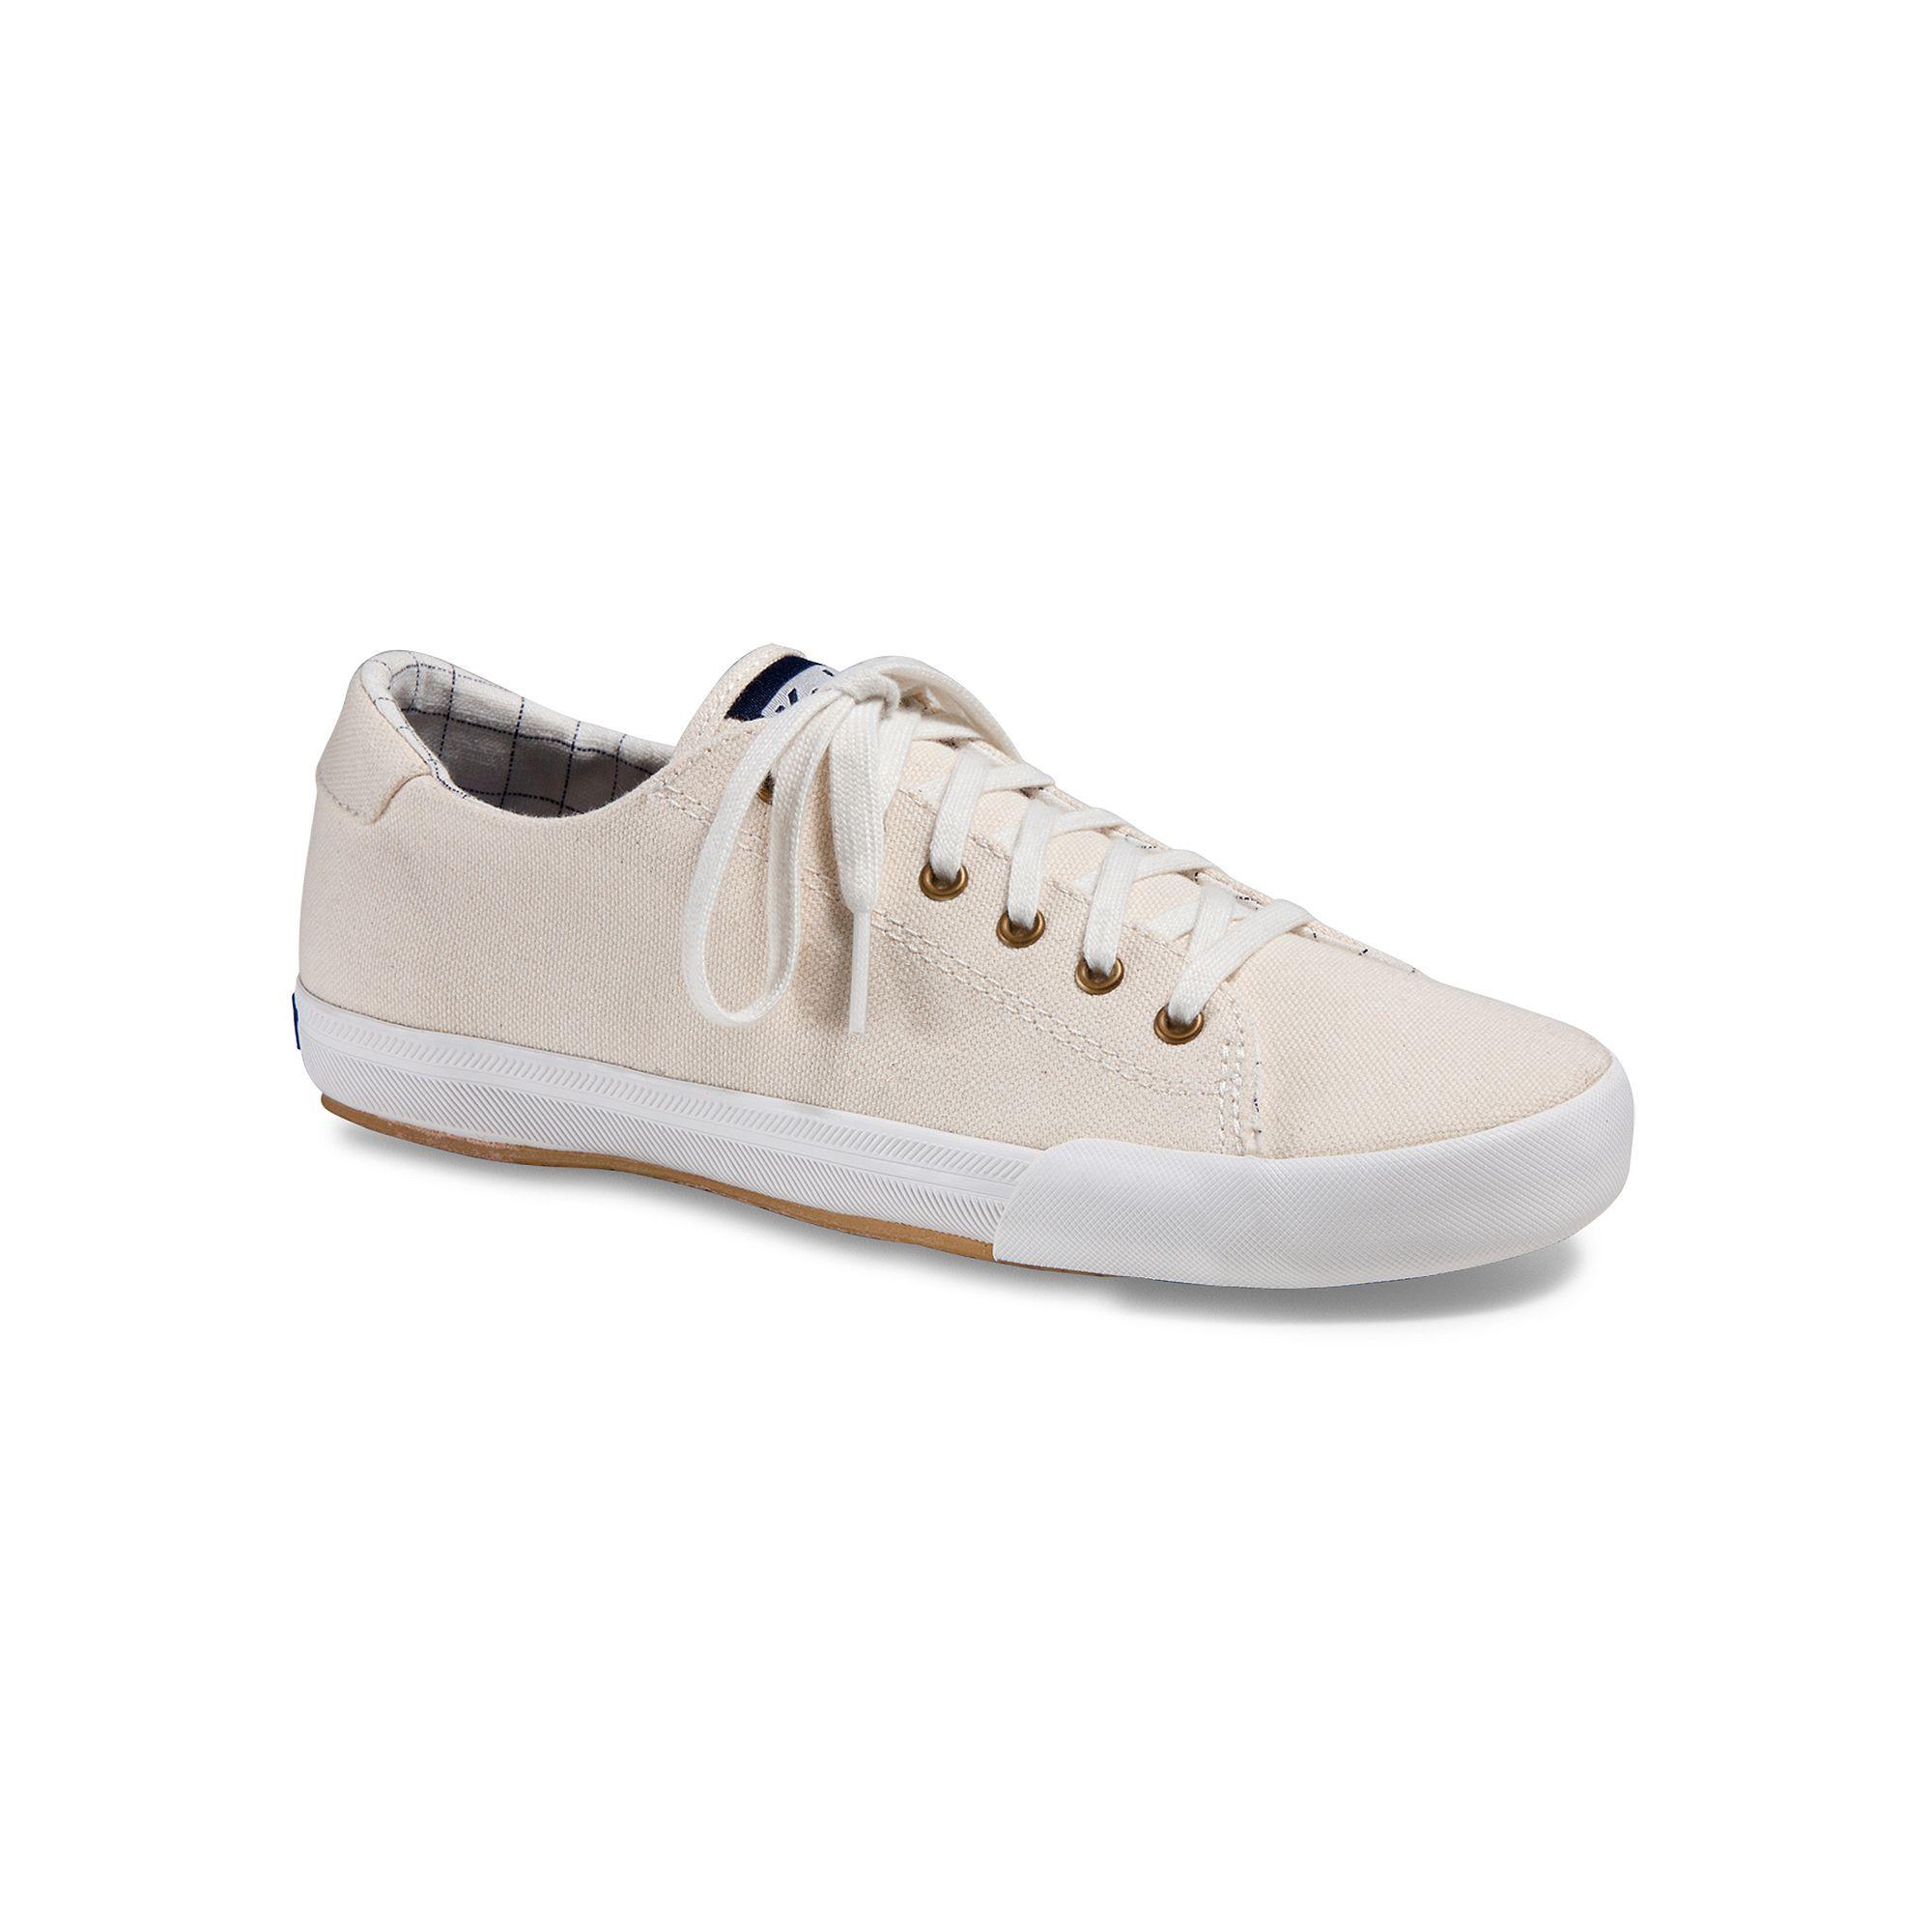 583de57e3952 Keds Lex Women s Ortholite Sneakers